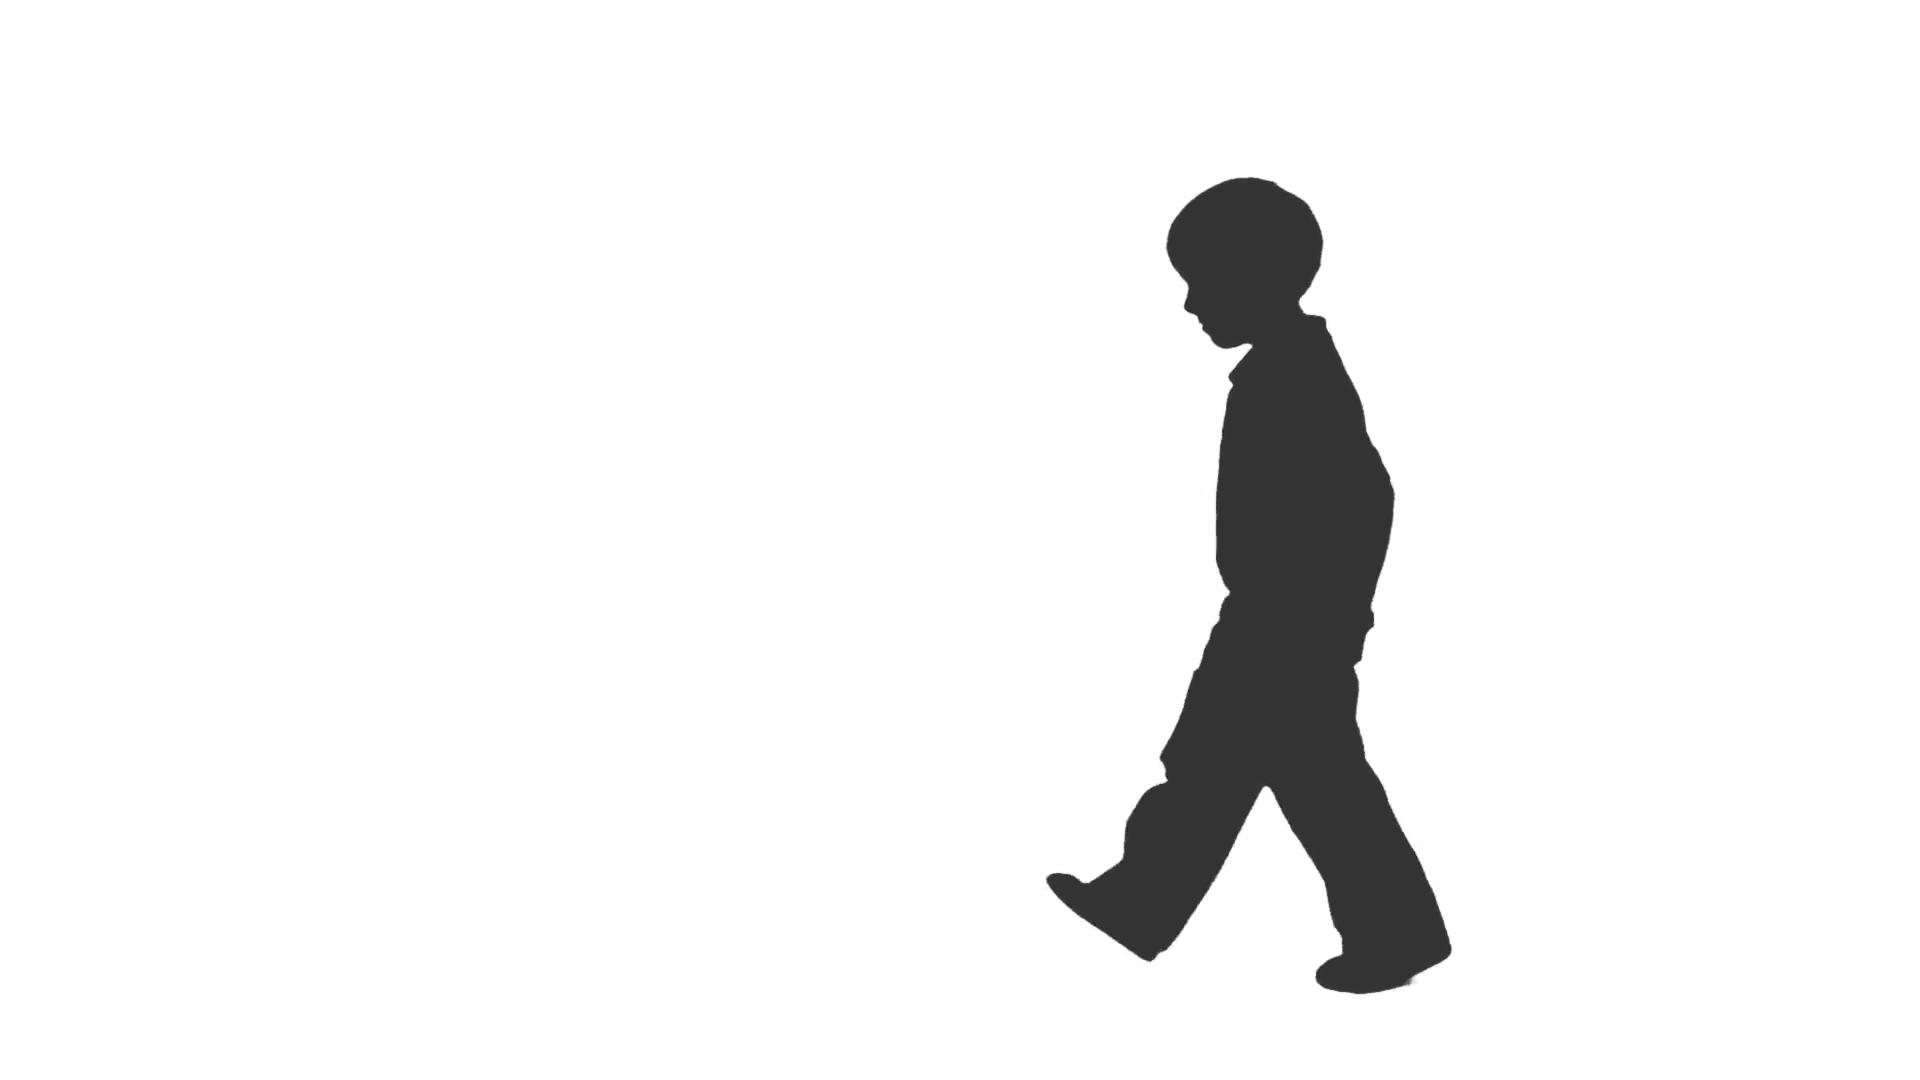 1920x1080 Silhouette Of A Little Boy Walks Forward And Backward. Side View